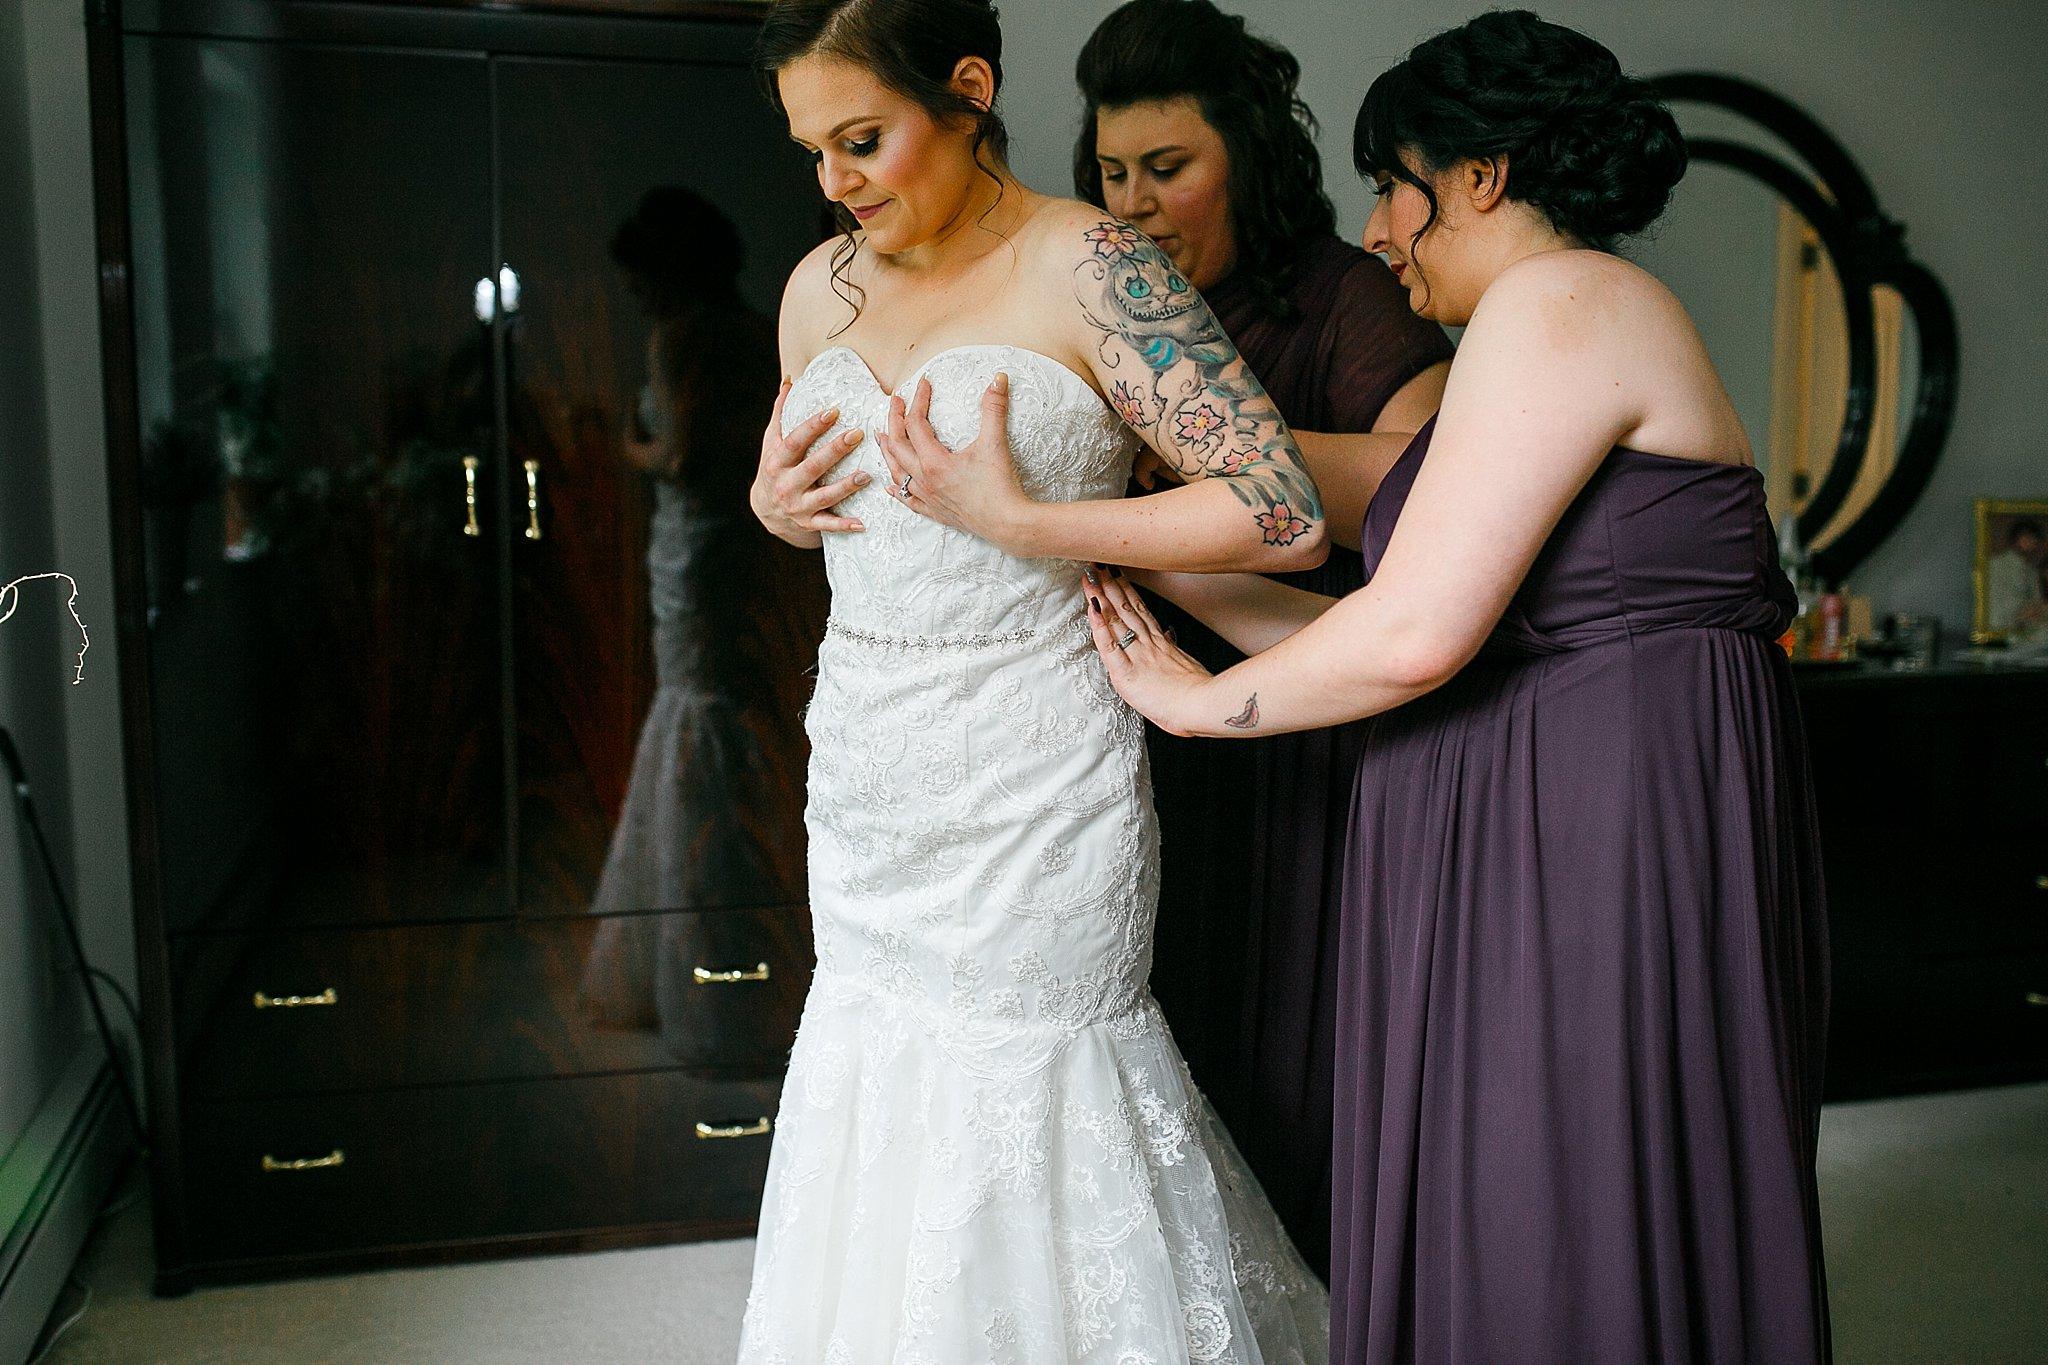 Links at Unionvale Wedding Lagrangeville Wedding Hudson Valley Wedding Photographer Sweet Alice Photography15.jpg